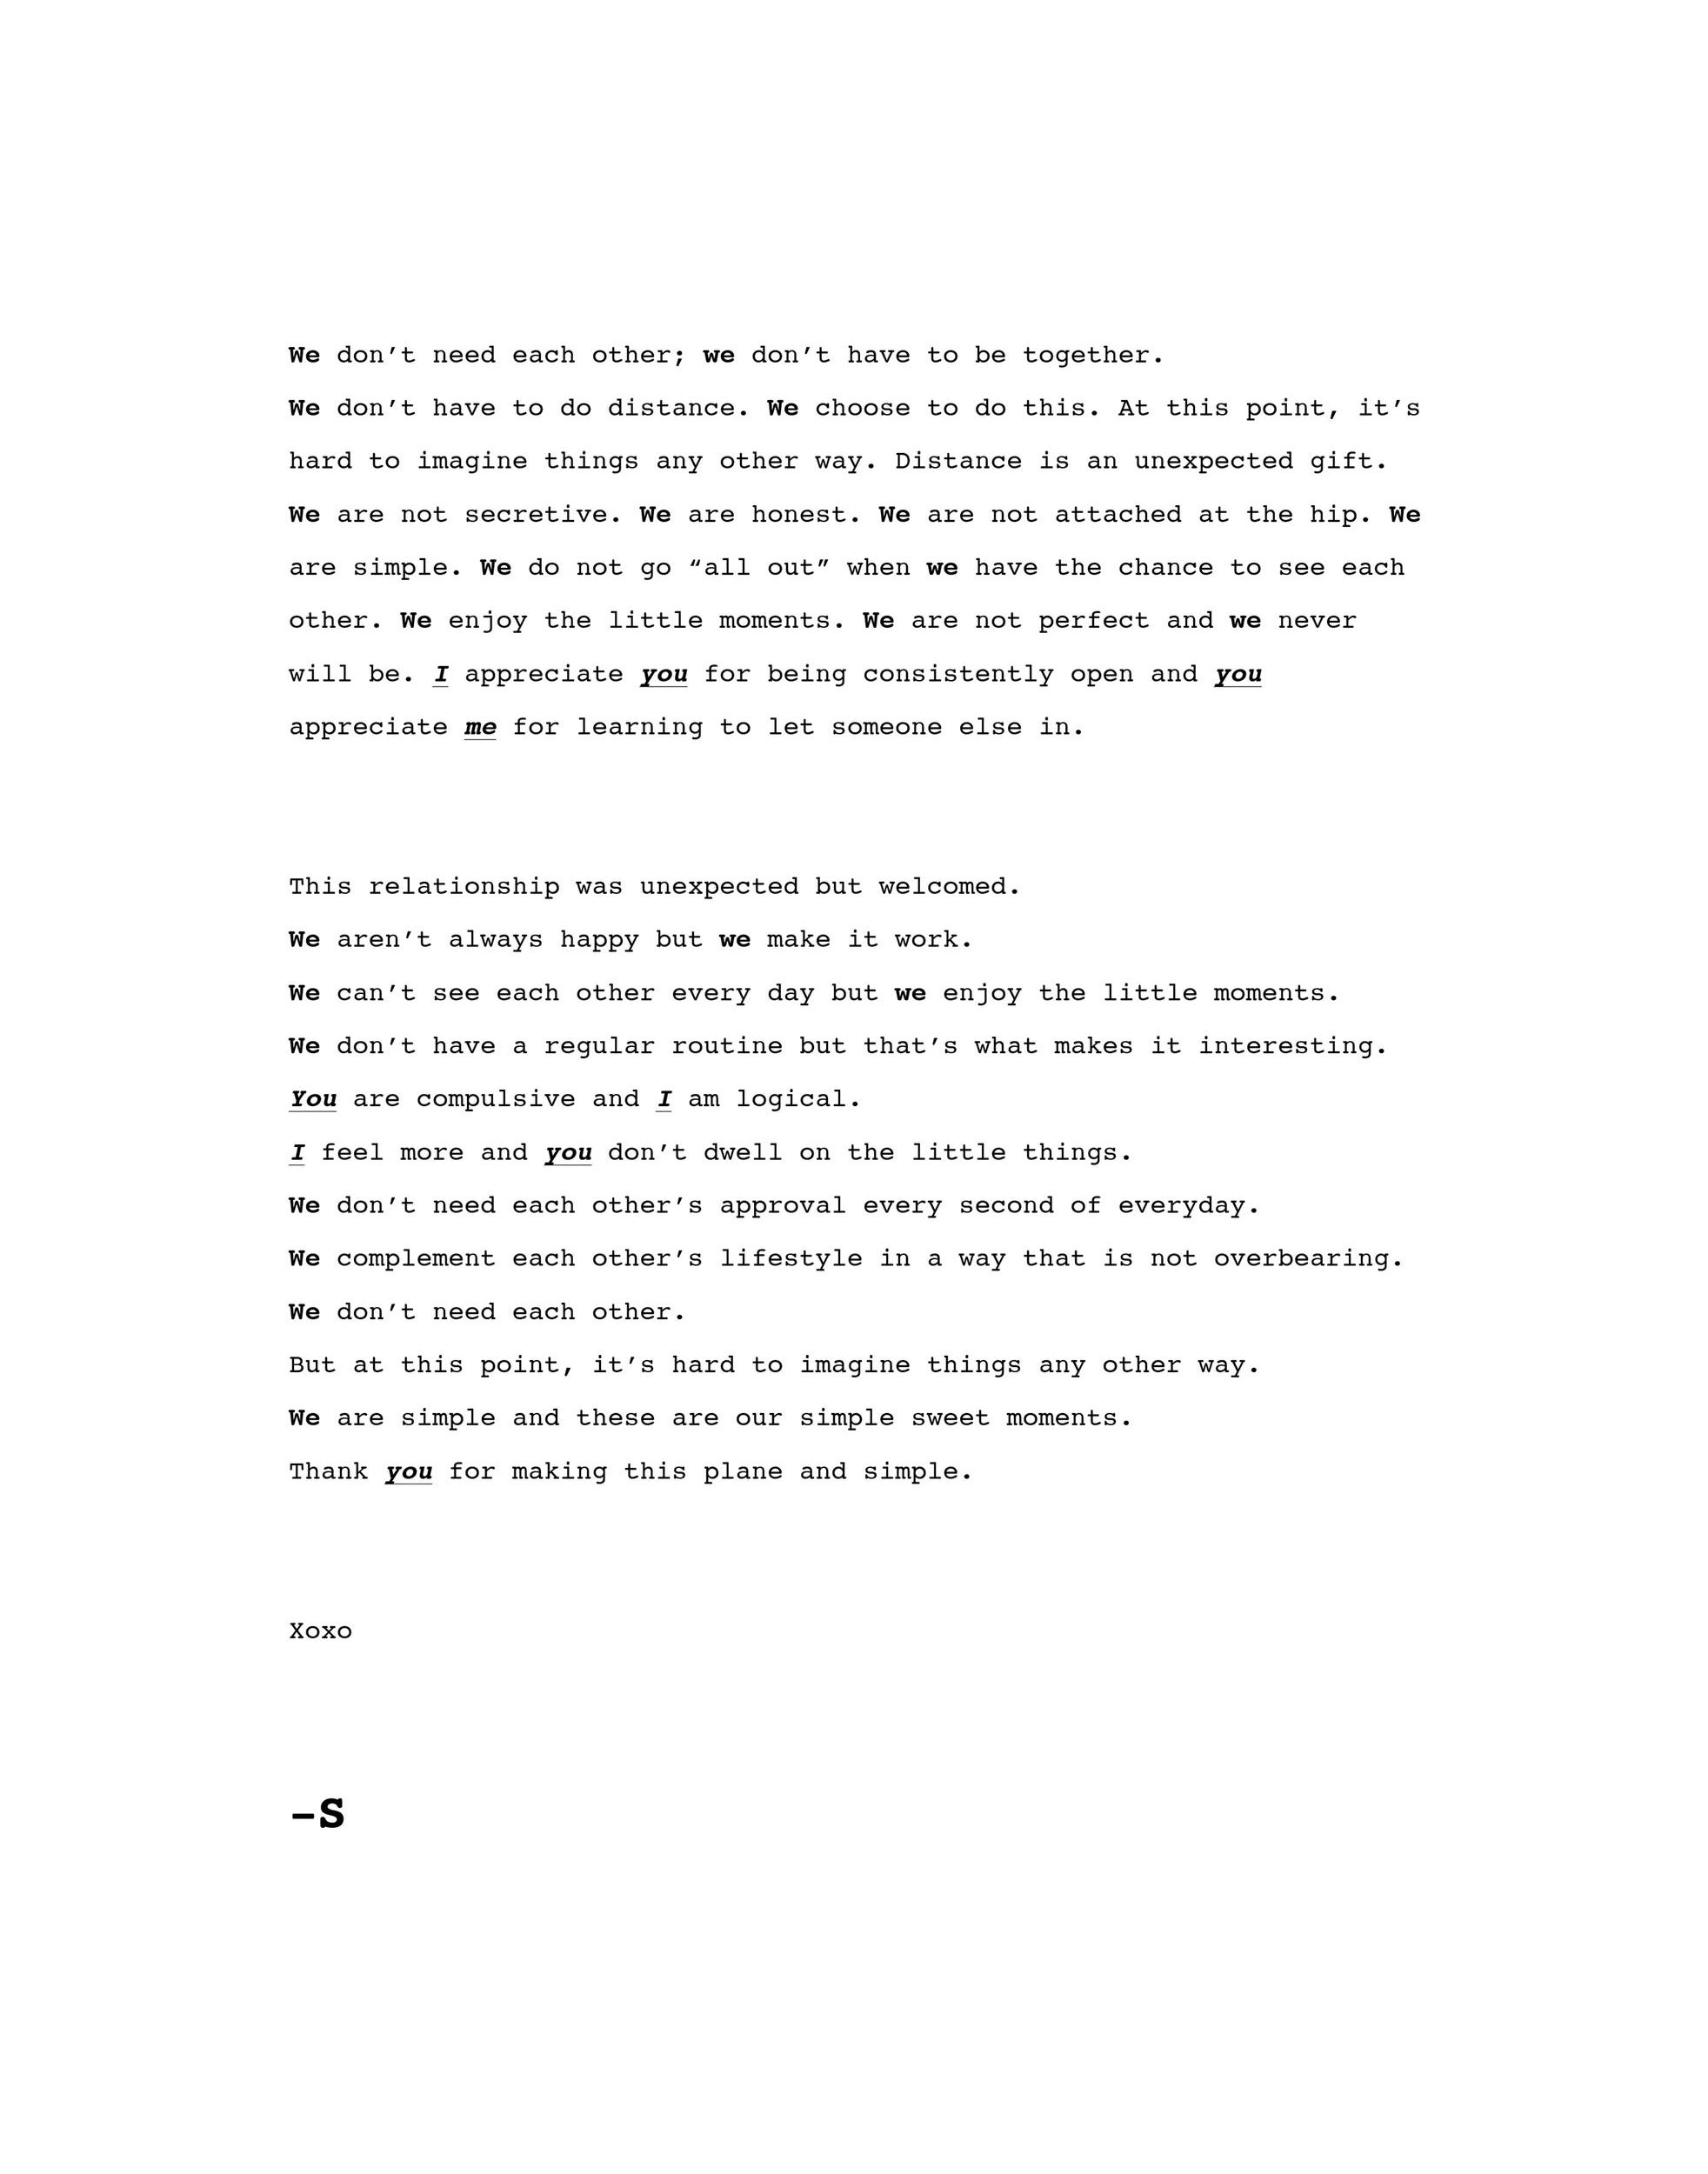 ItsNotYouItsMe-11x4-BACKGROUND-LETTER1.jpg